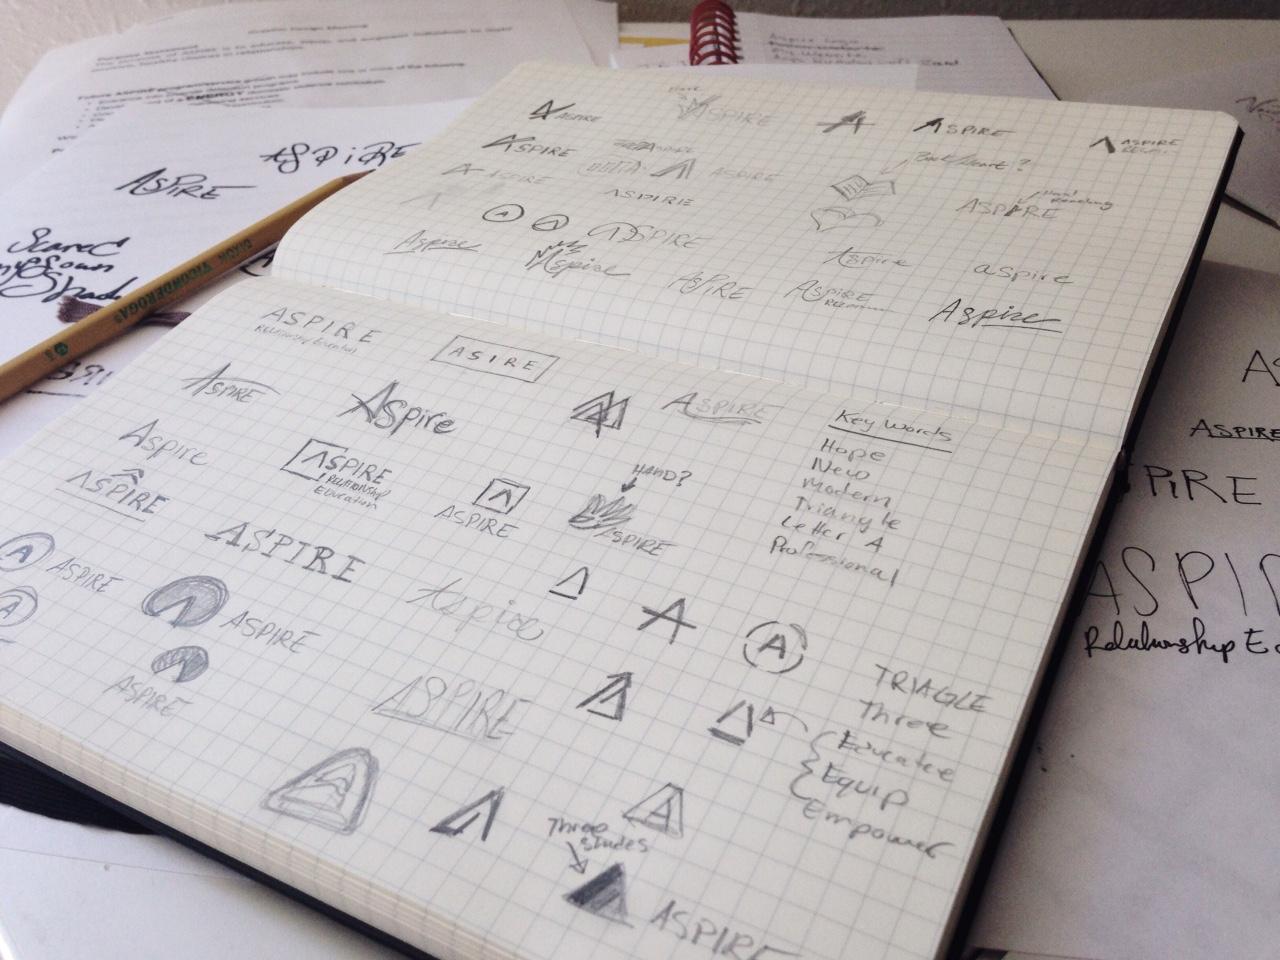 Aspire Sketches